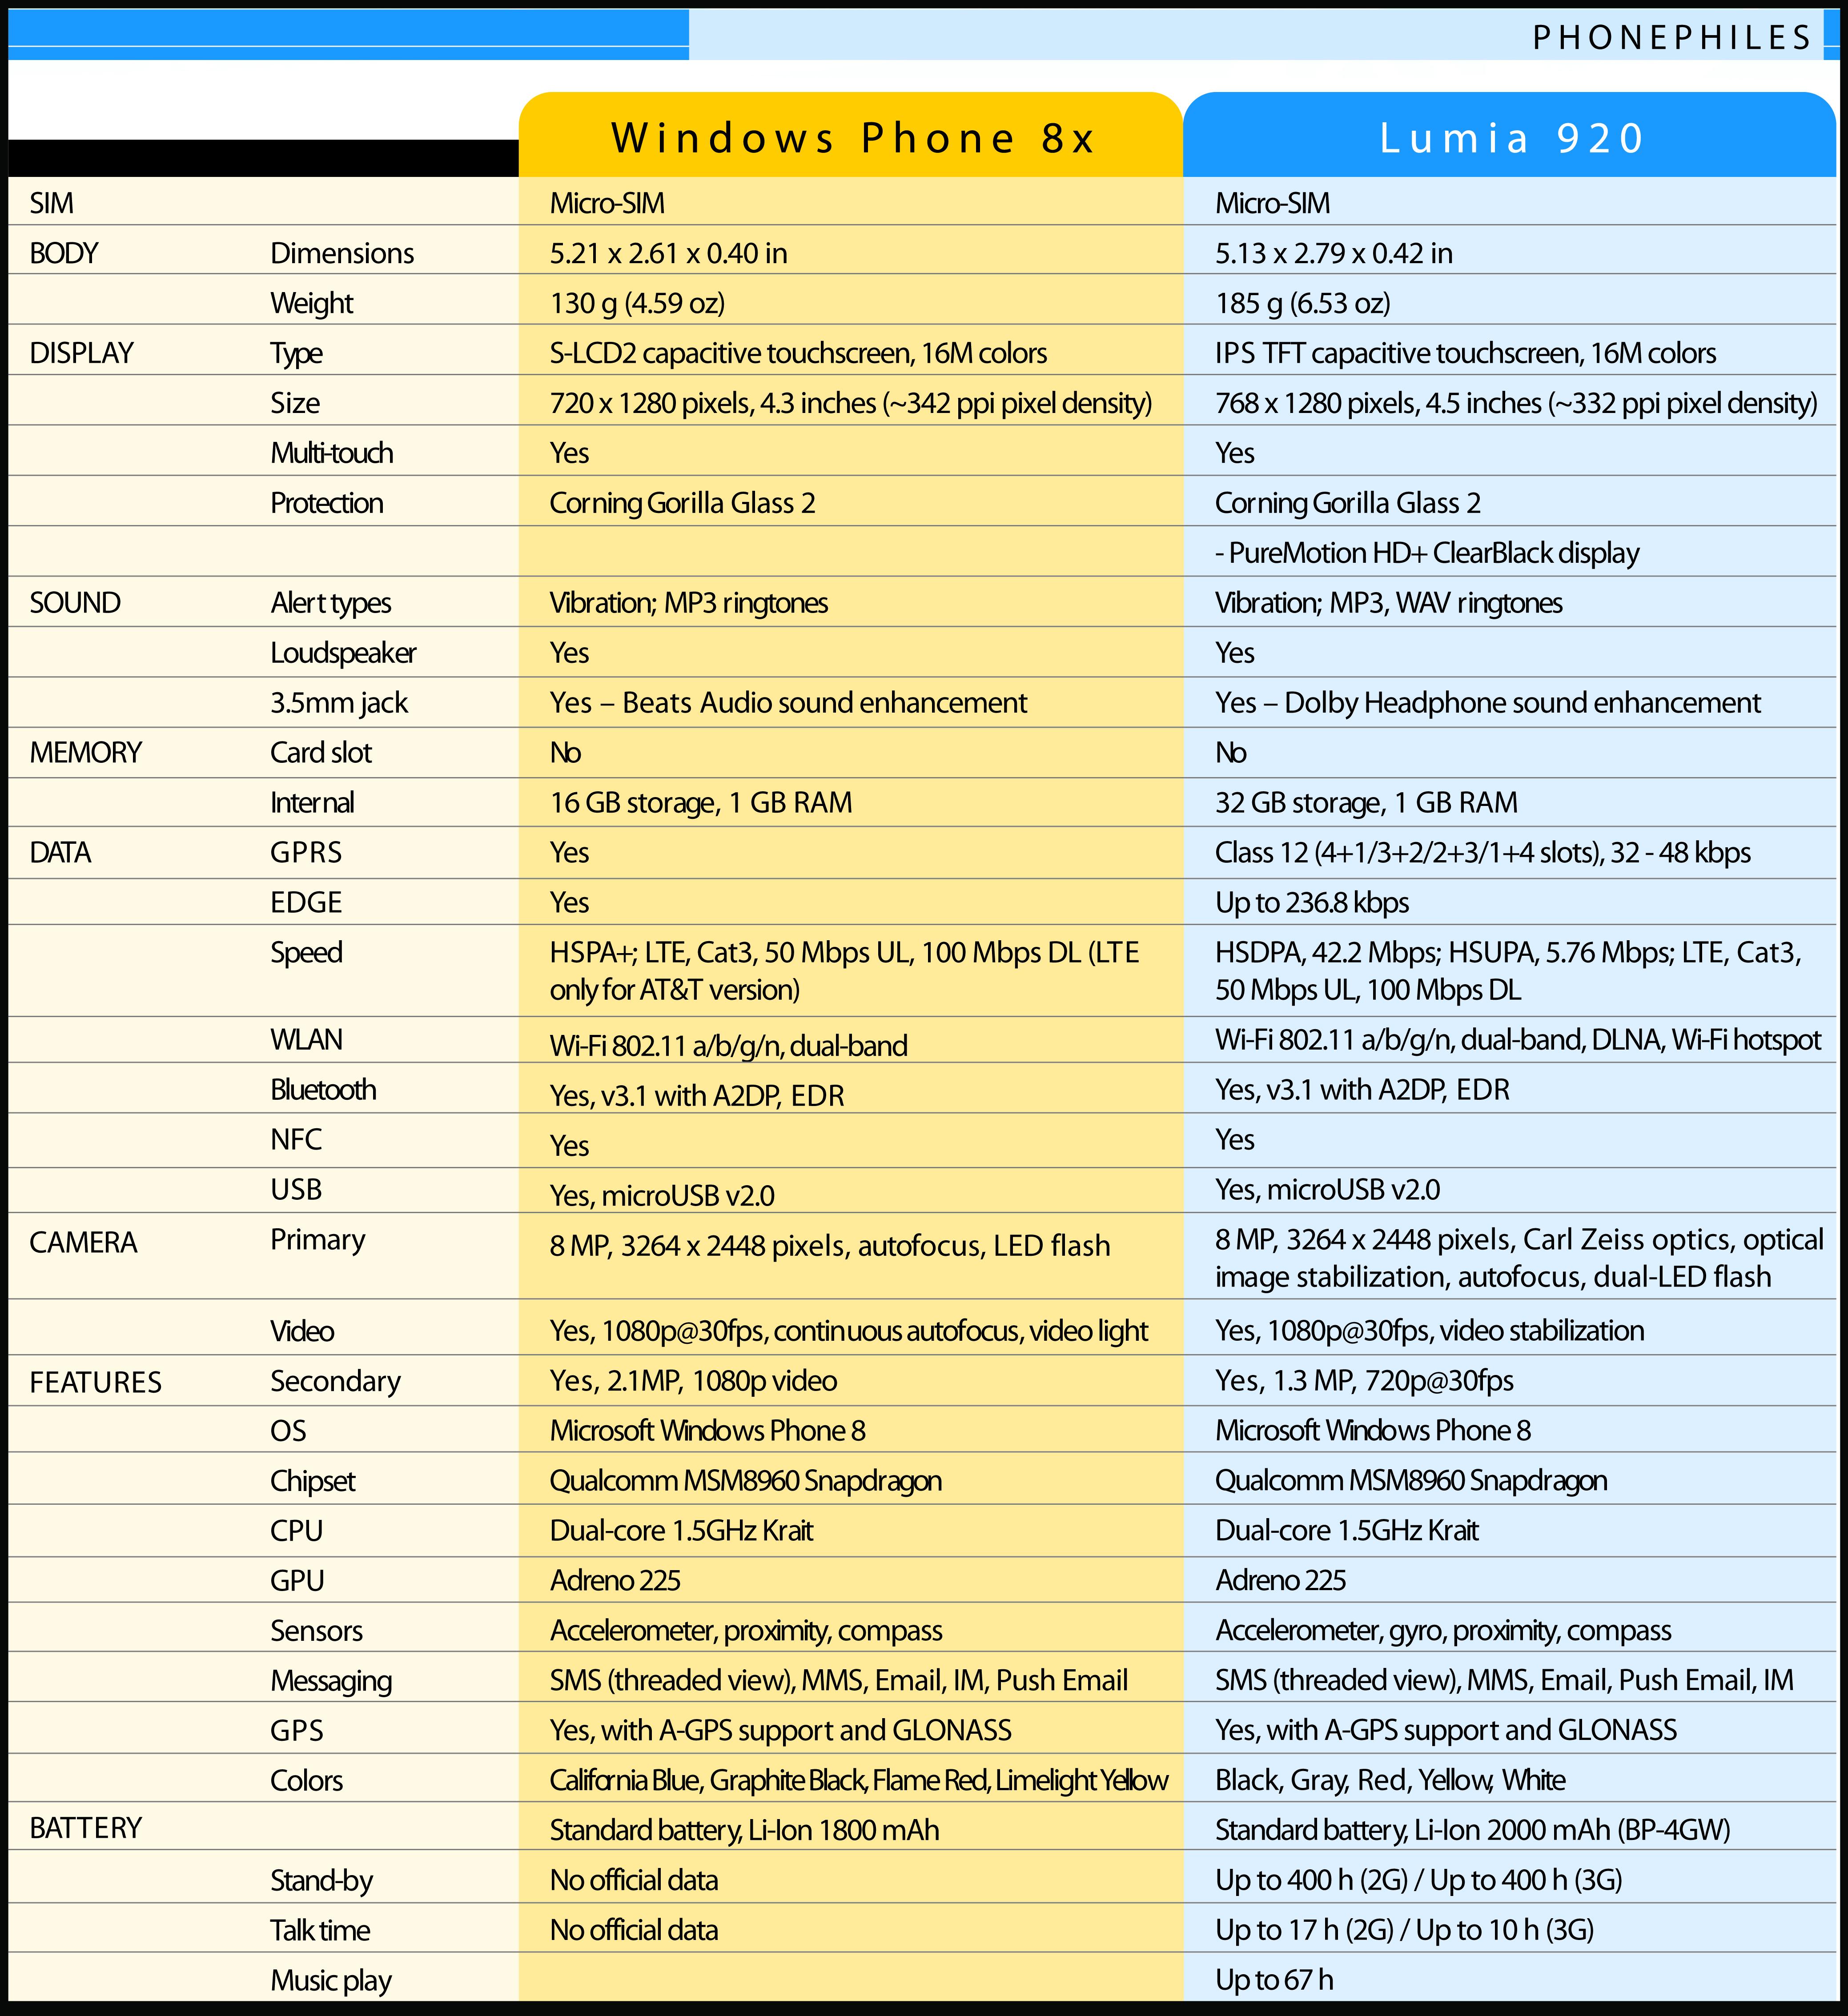 Specs 8X vs Lumia 920